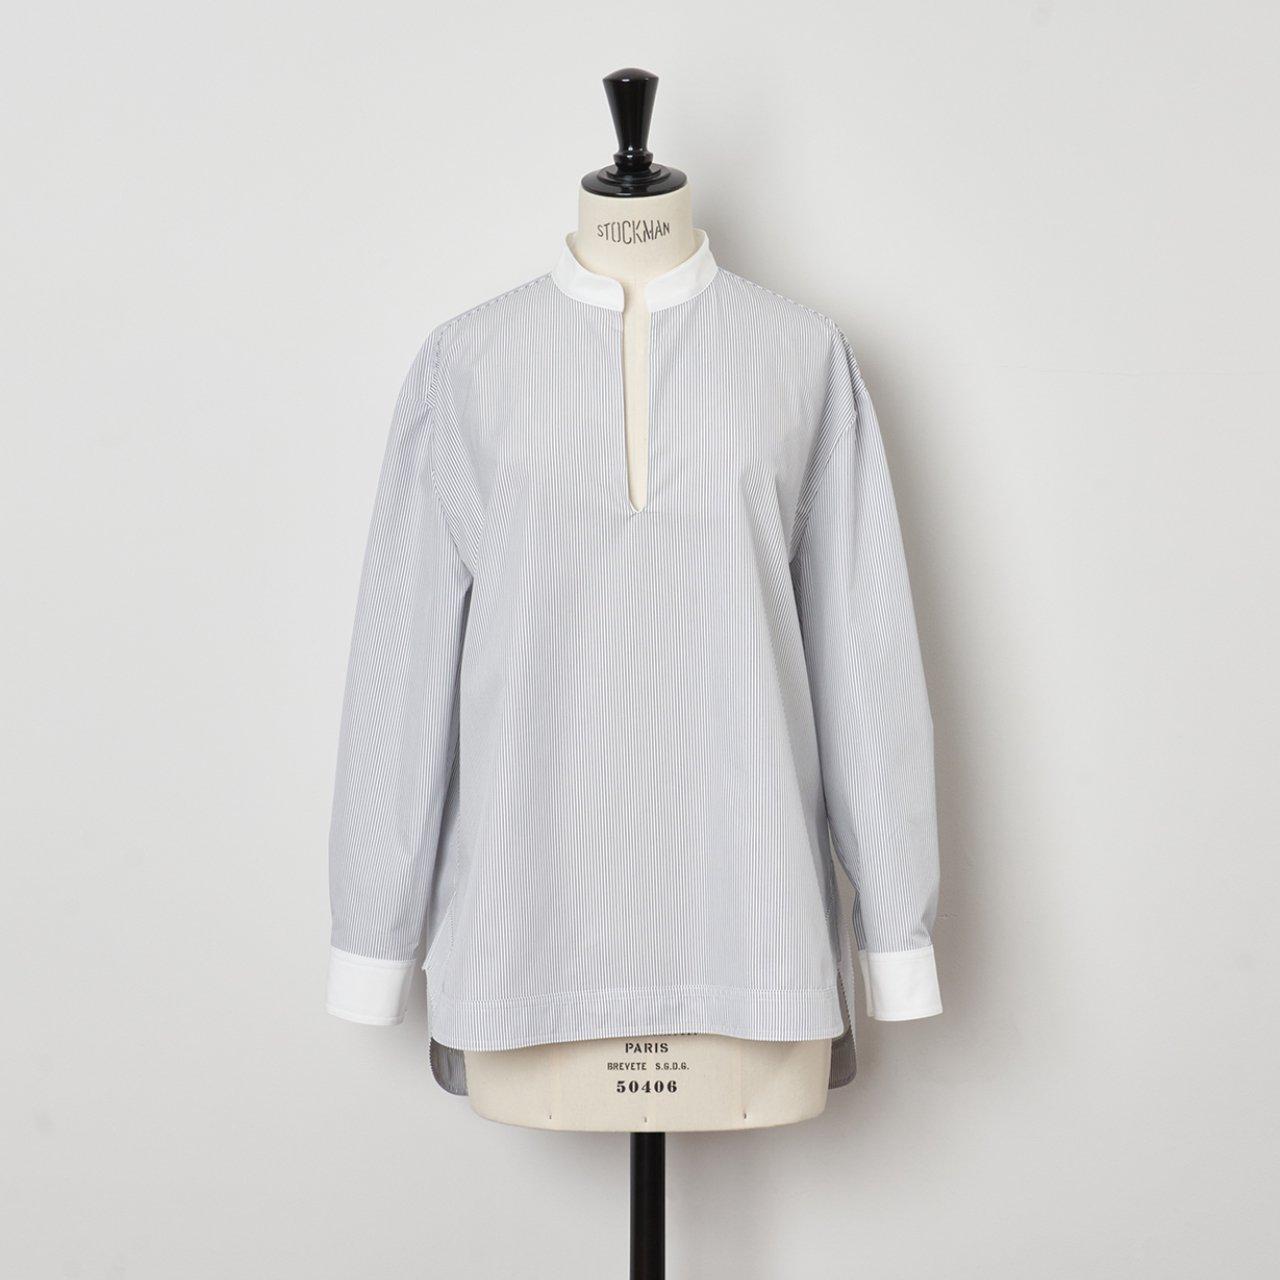 SINME <BR>Vネックオープンシャツ<BR>ホワイト×ネイビーストライプ